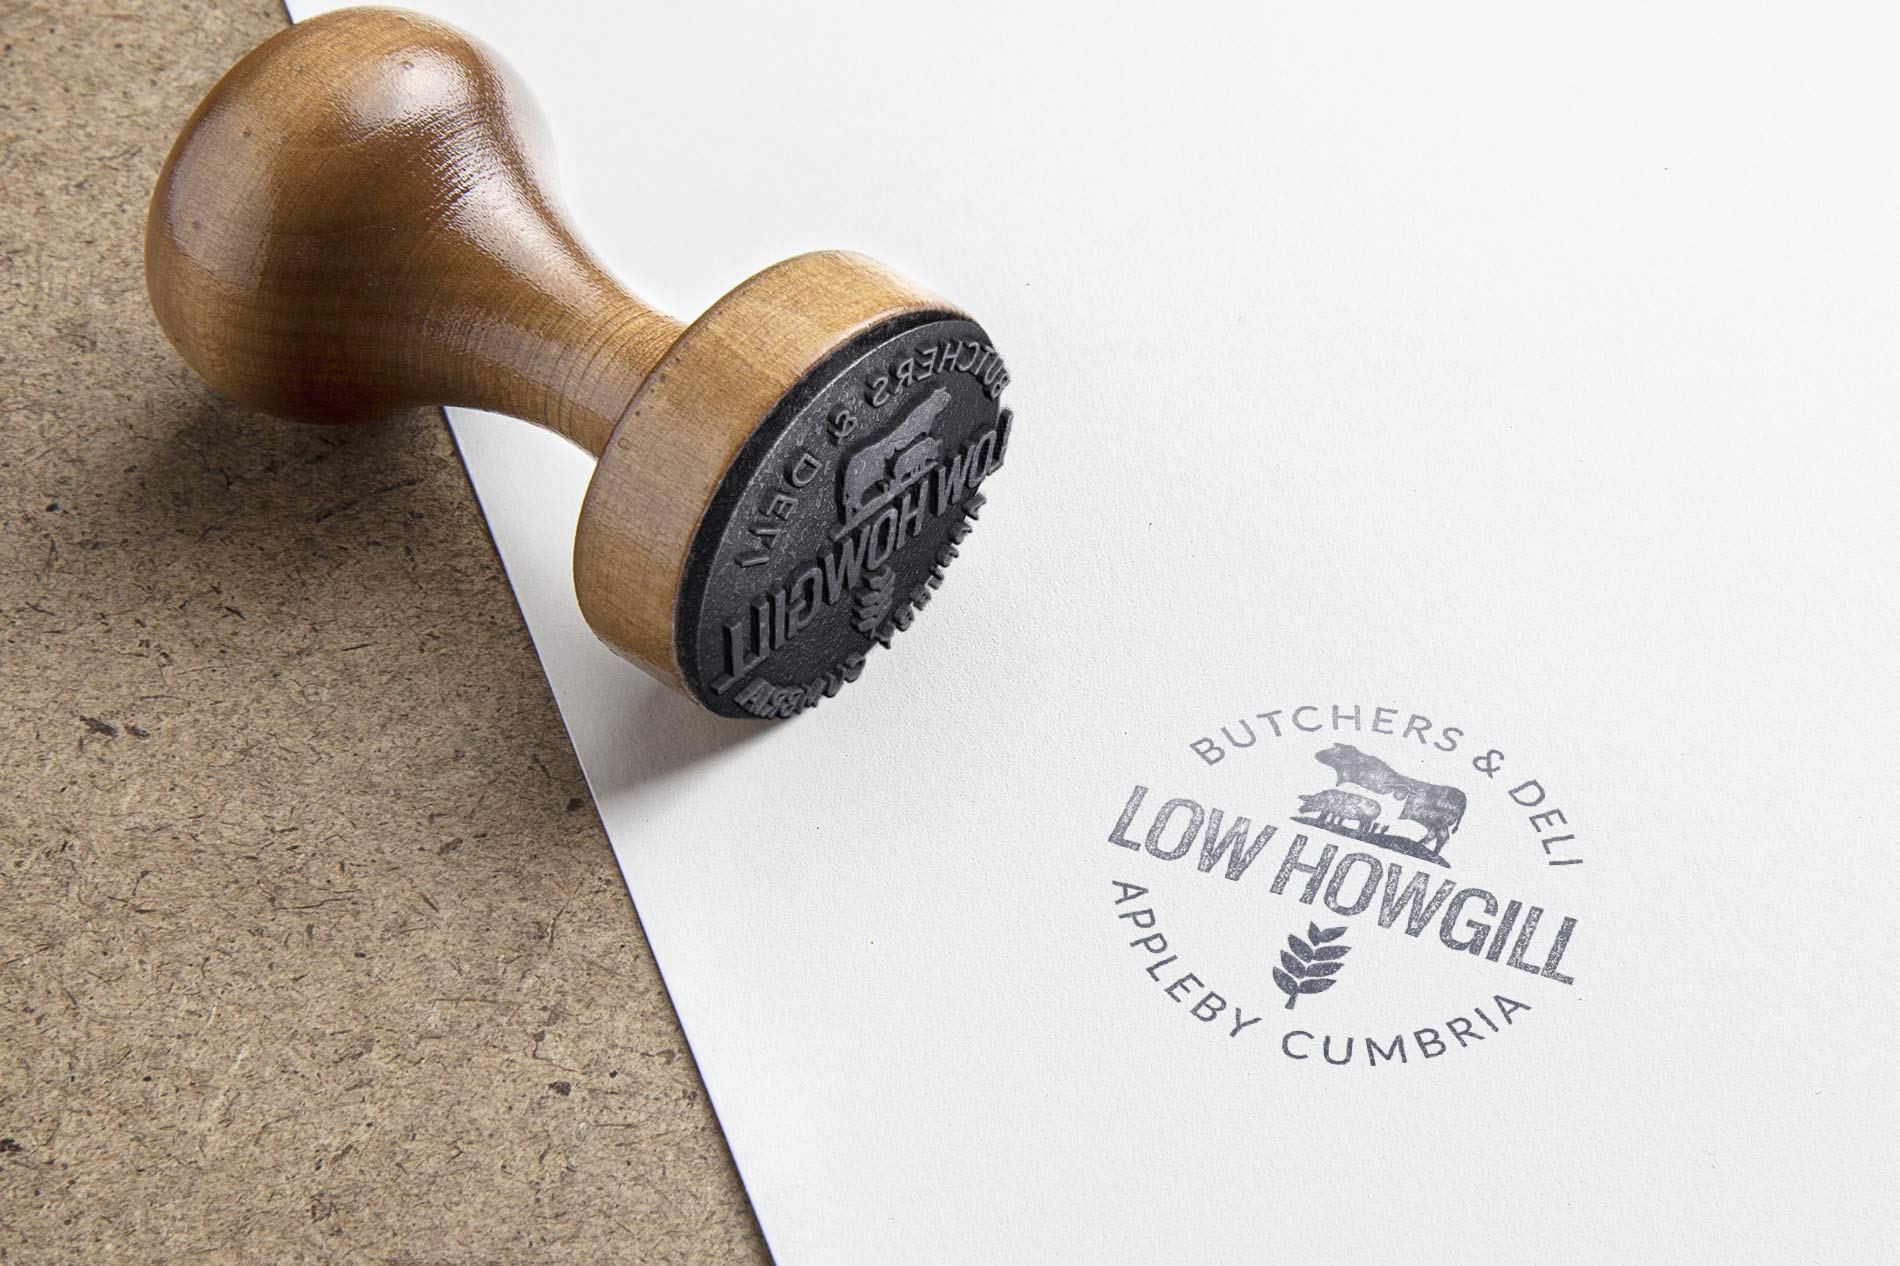 Low Howgill Butcher Brand Logo Design